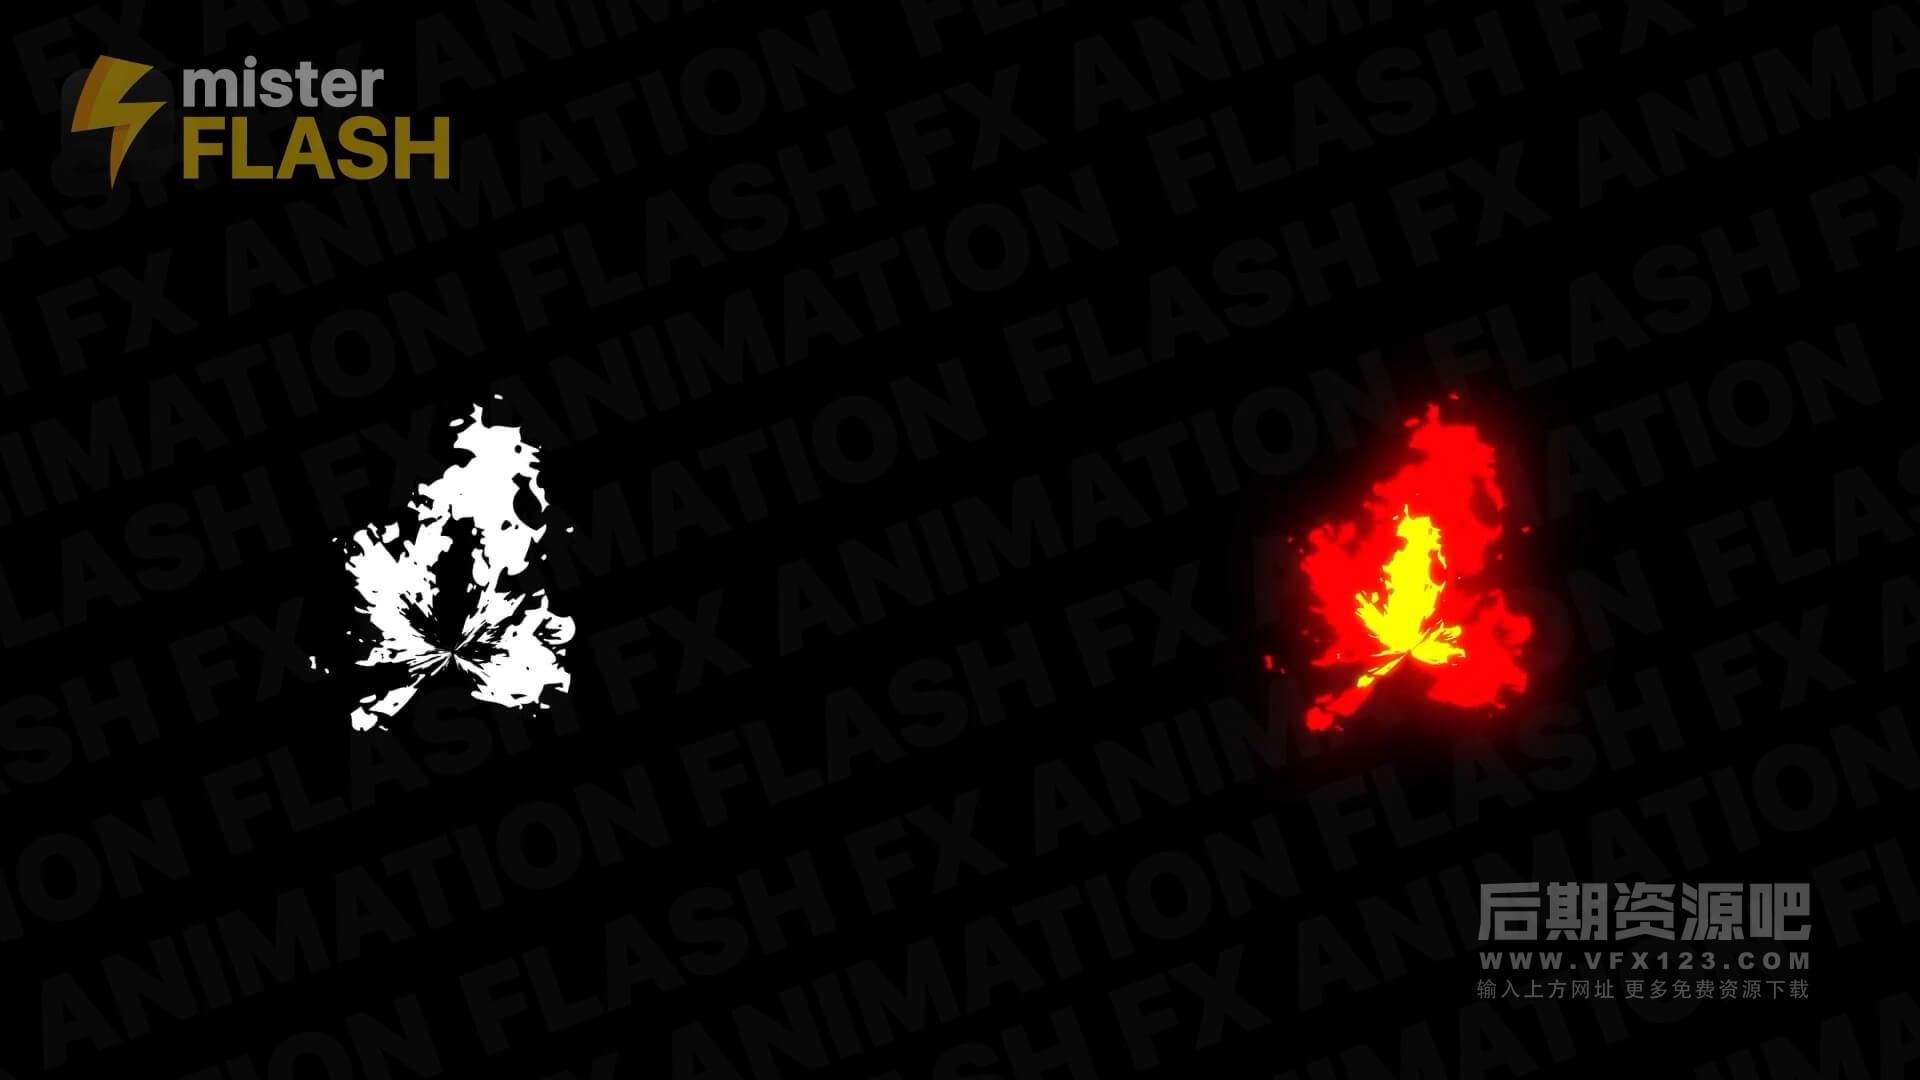 fcpx插件 12个卡通手绘风格火焰MG动画素材 带音效 Burning Elements